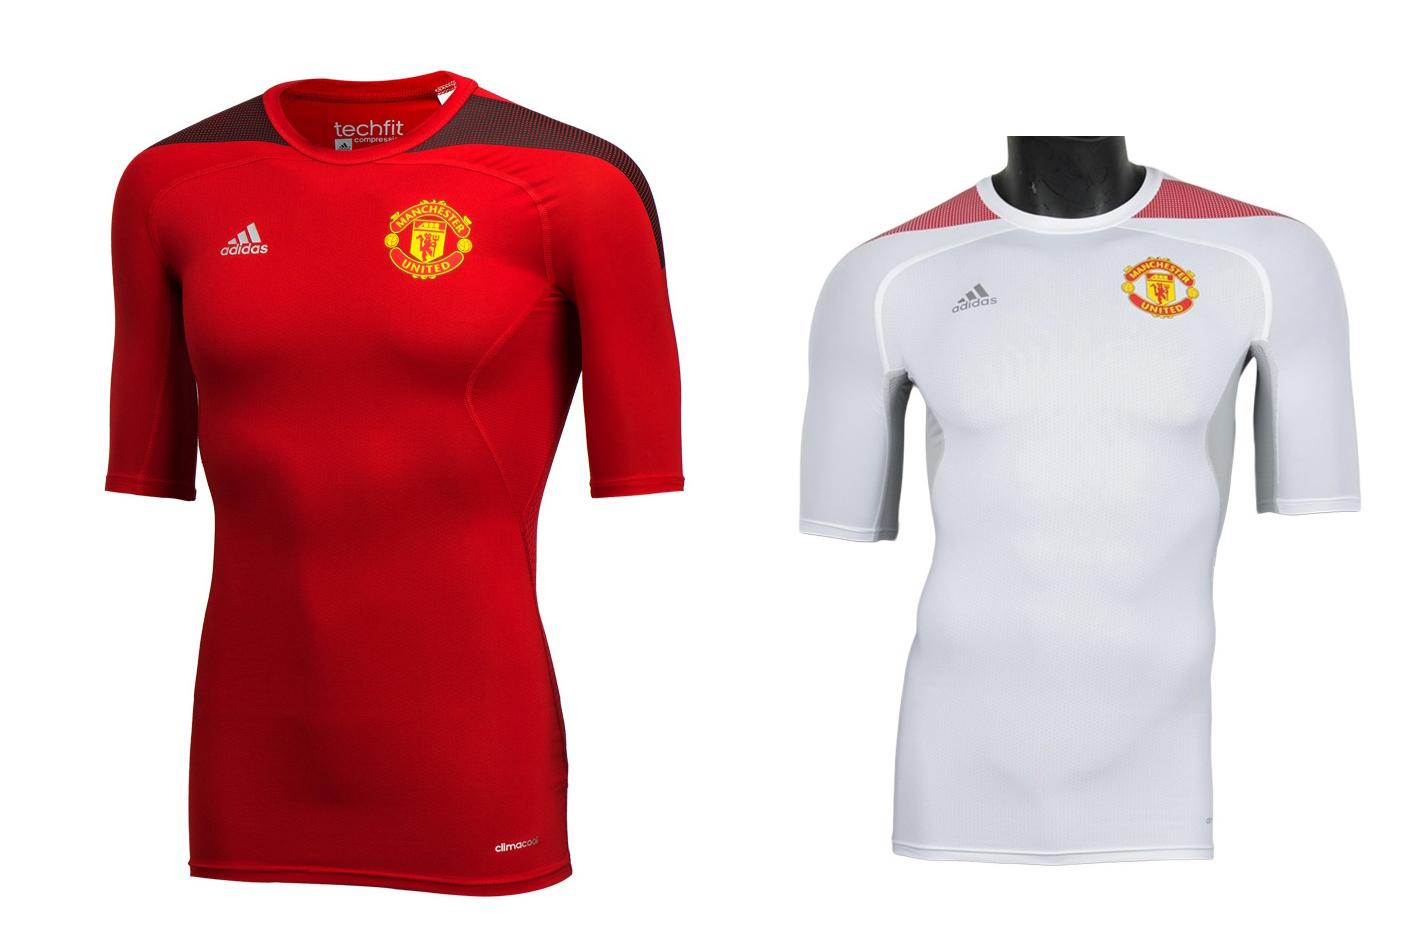 d83795208ae Man Utd Shirt Sales Figures - DREAMWORKS